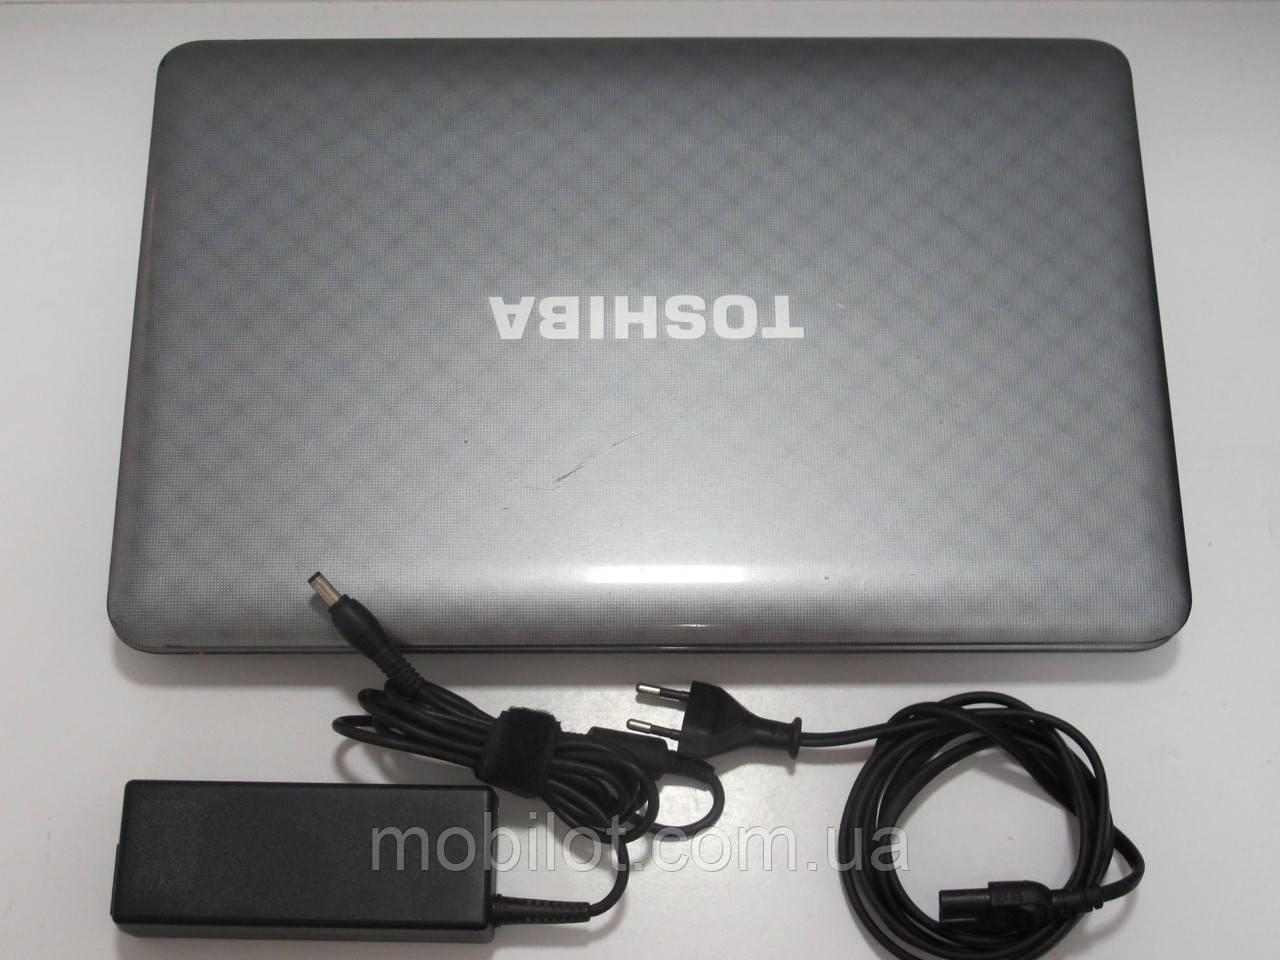 Ноутбук Toshiba Satellite L755-16P (NR-6355)